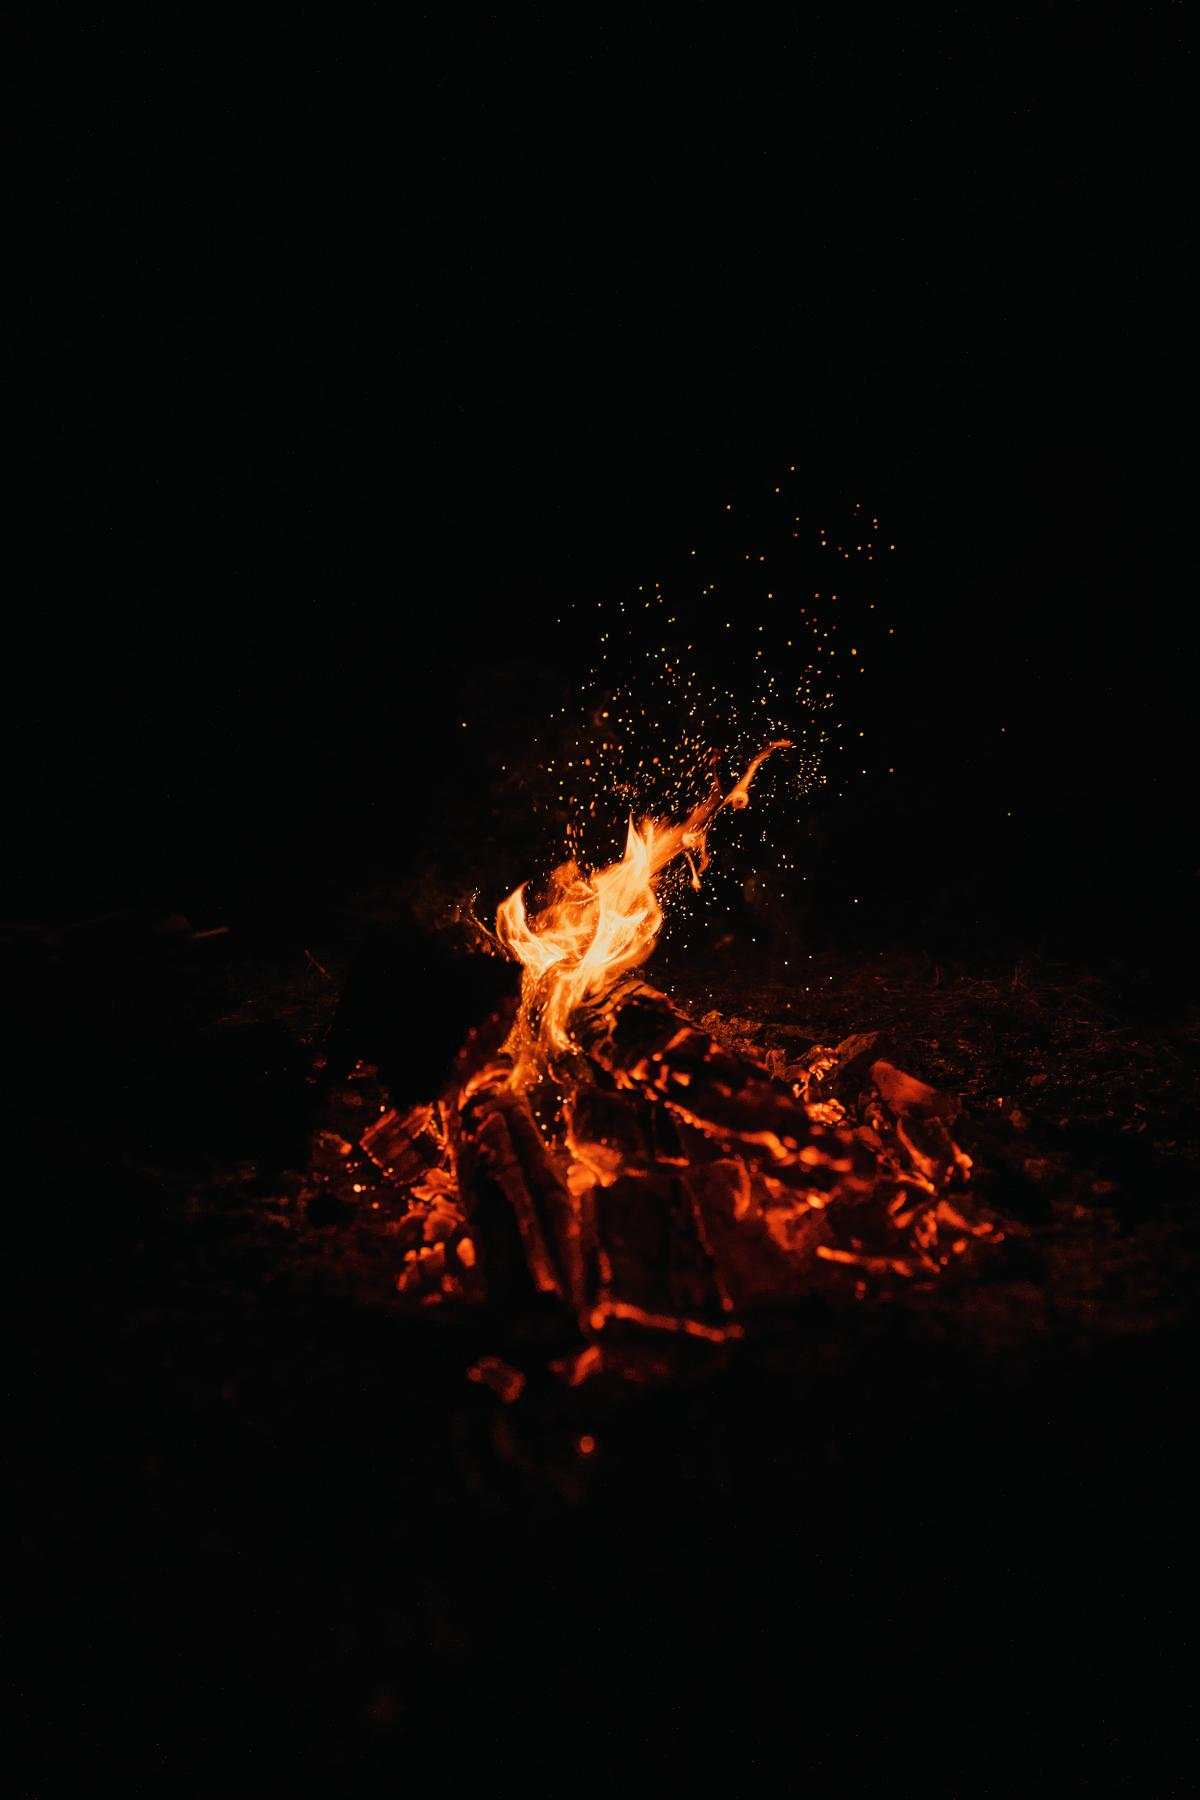 Blaze Fireplace Fire